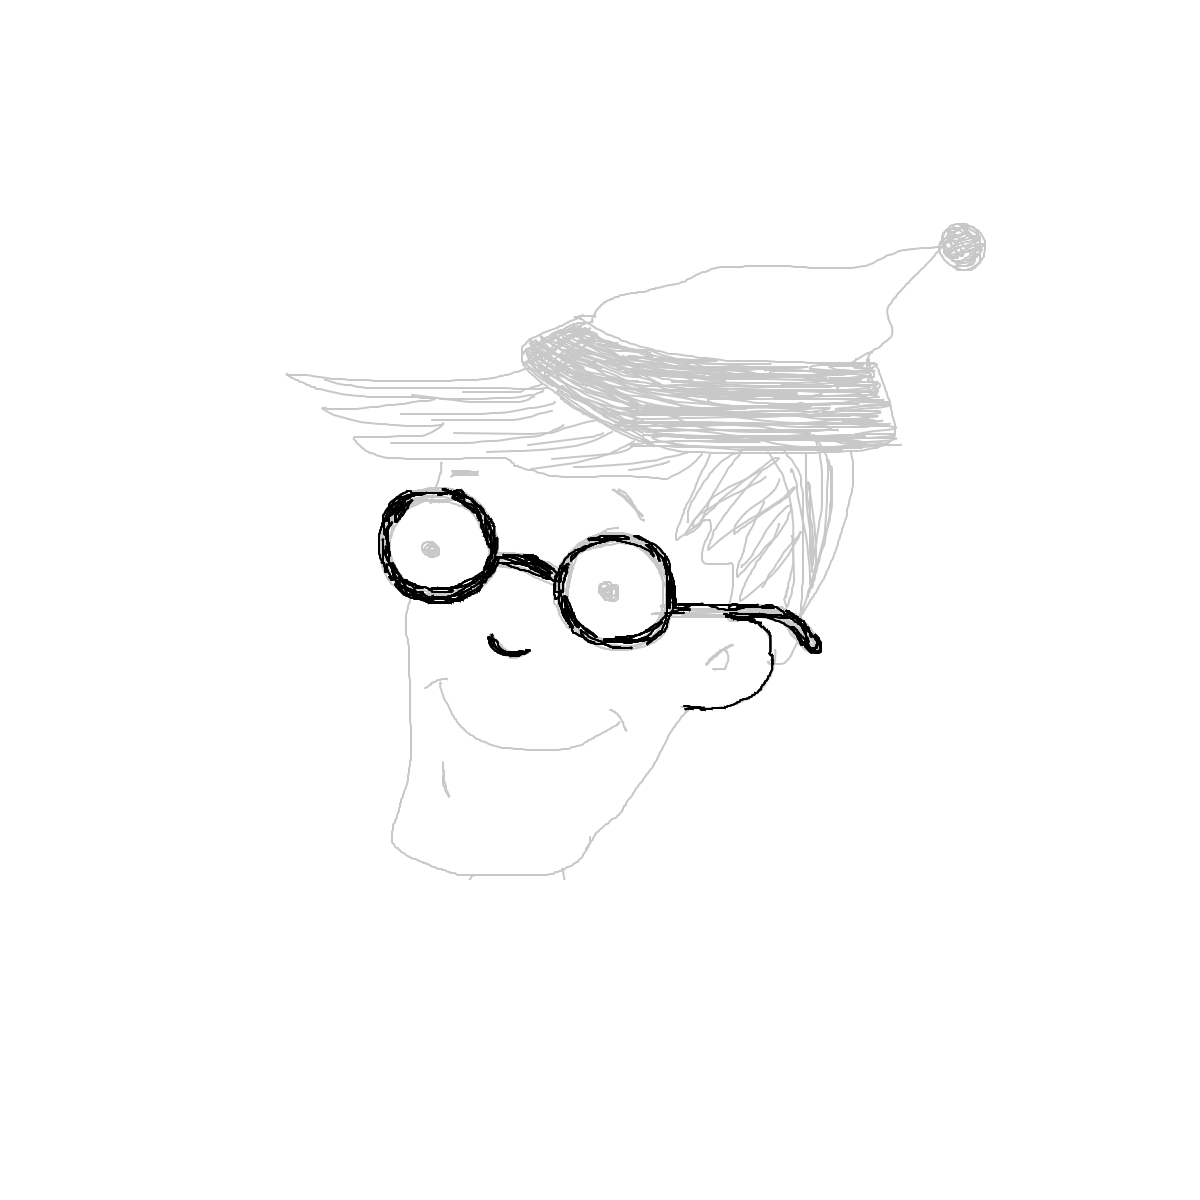 BAAAM drawing#5842 lat:41.6676788330078100lng: -0.8849841952323914